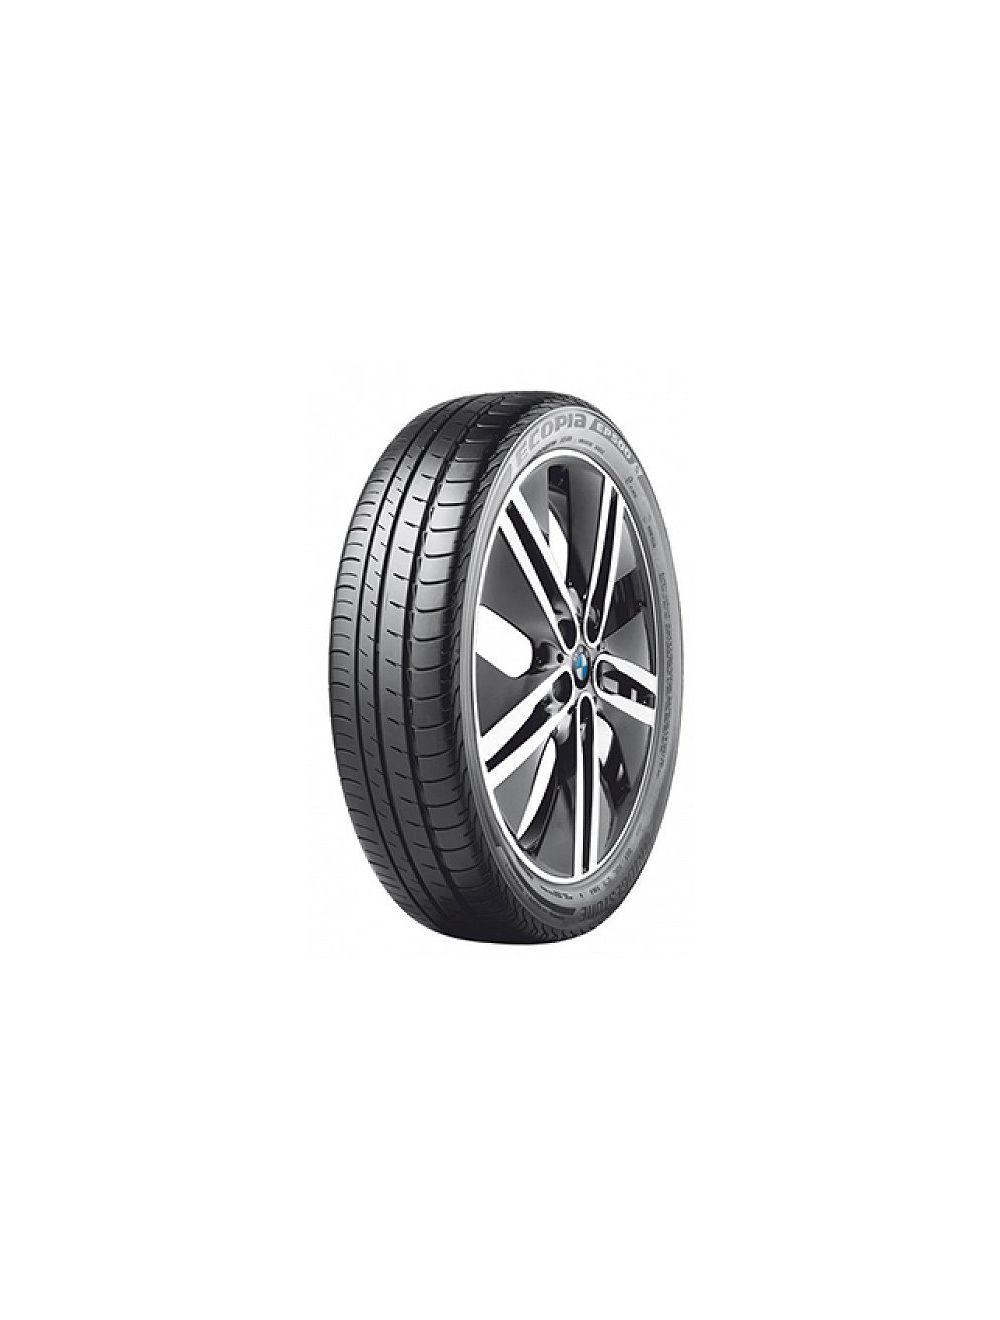 Bridgestone 175/55R20 T EP500 XL * Nyári gumi